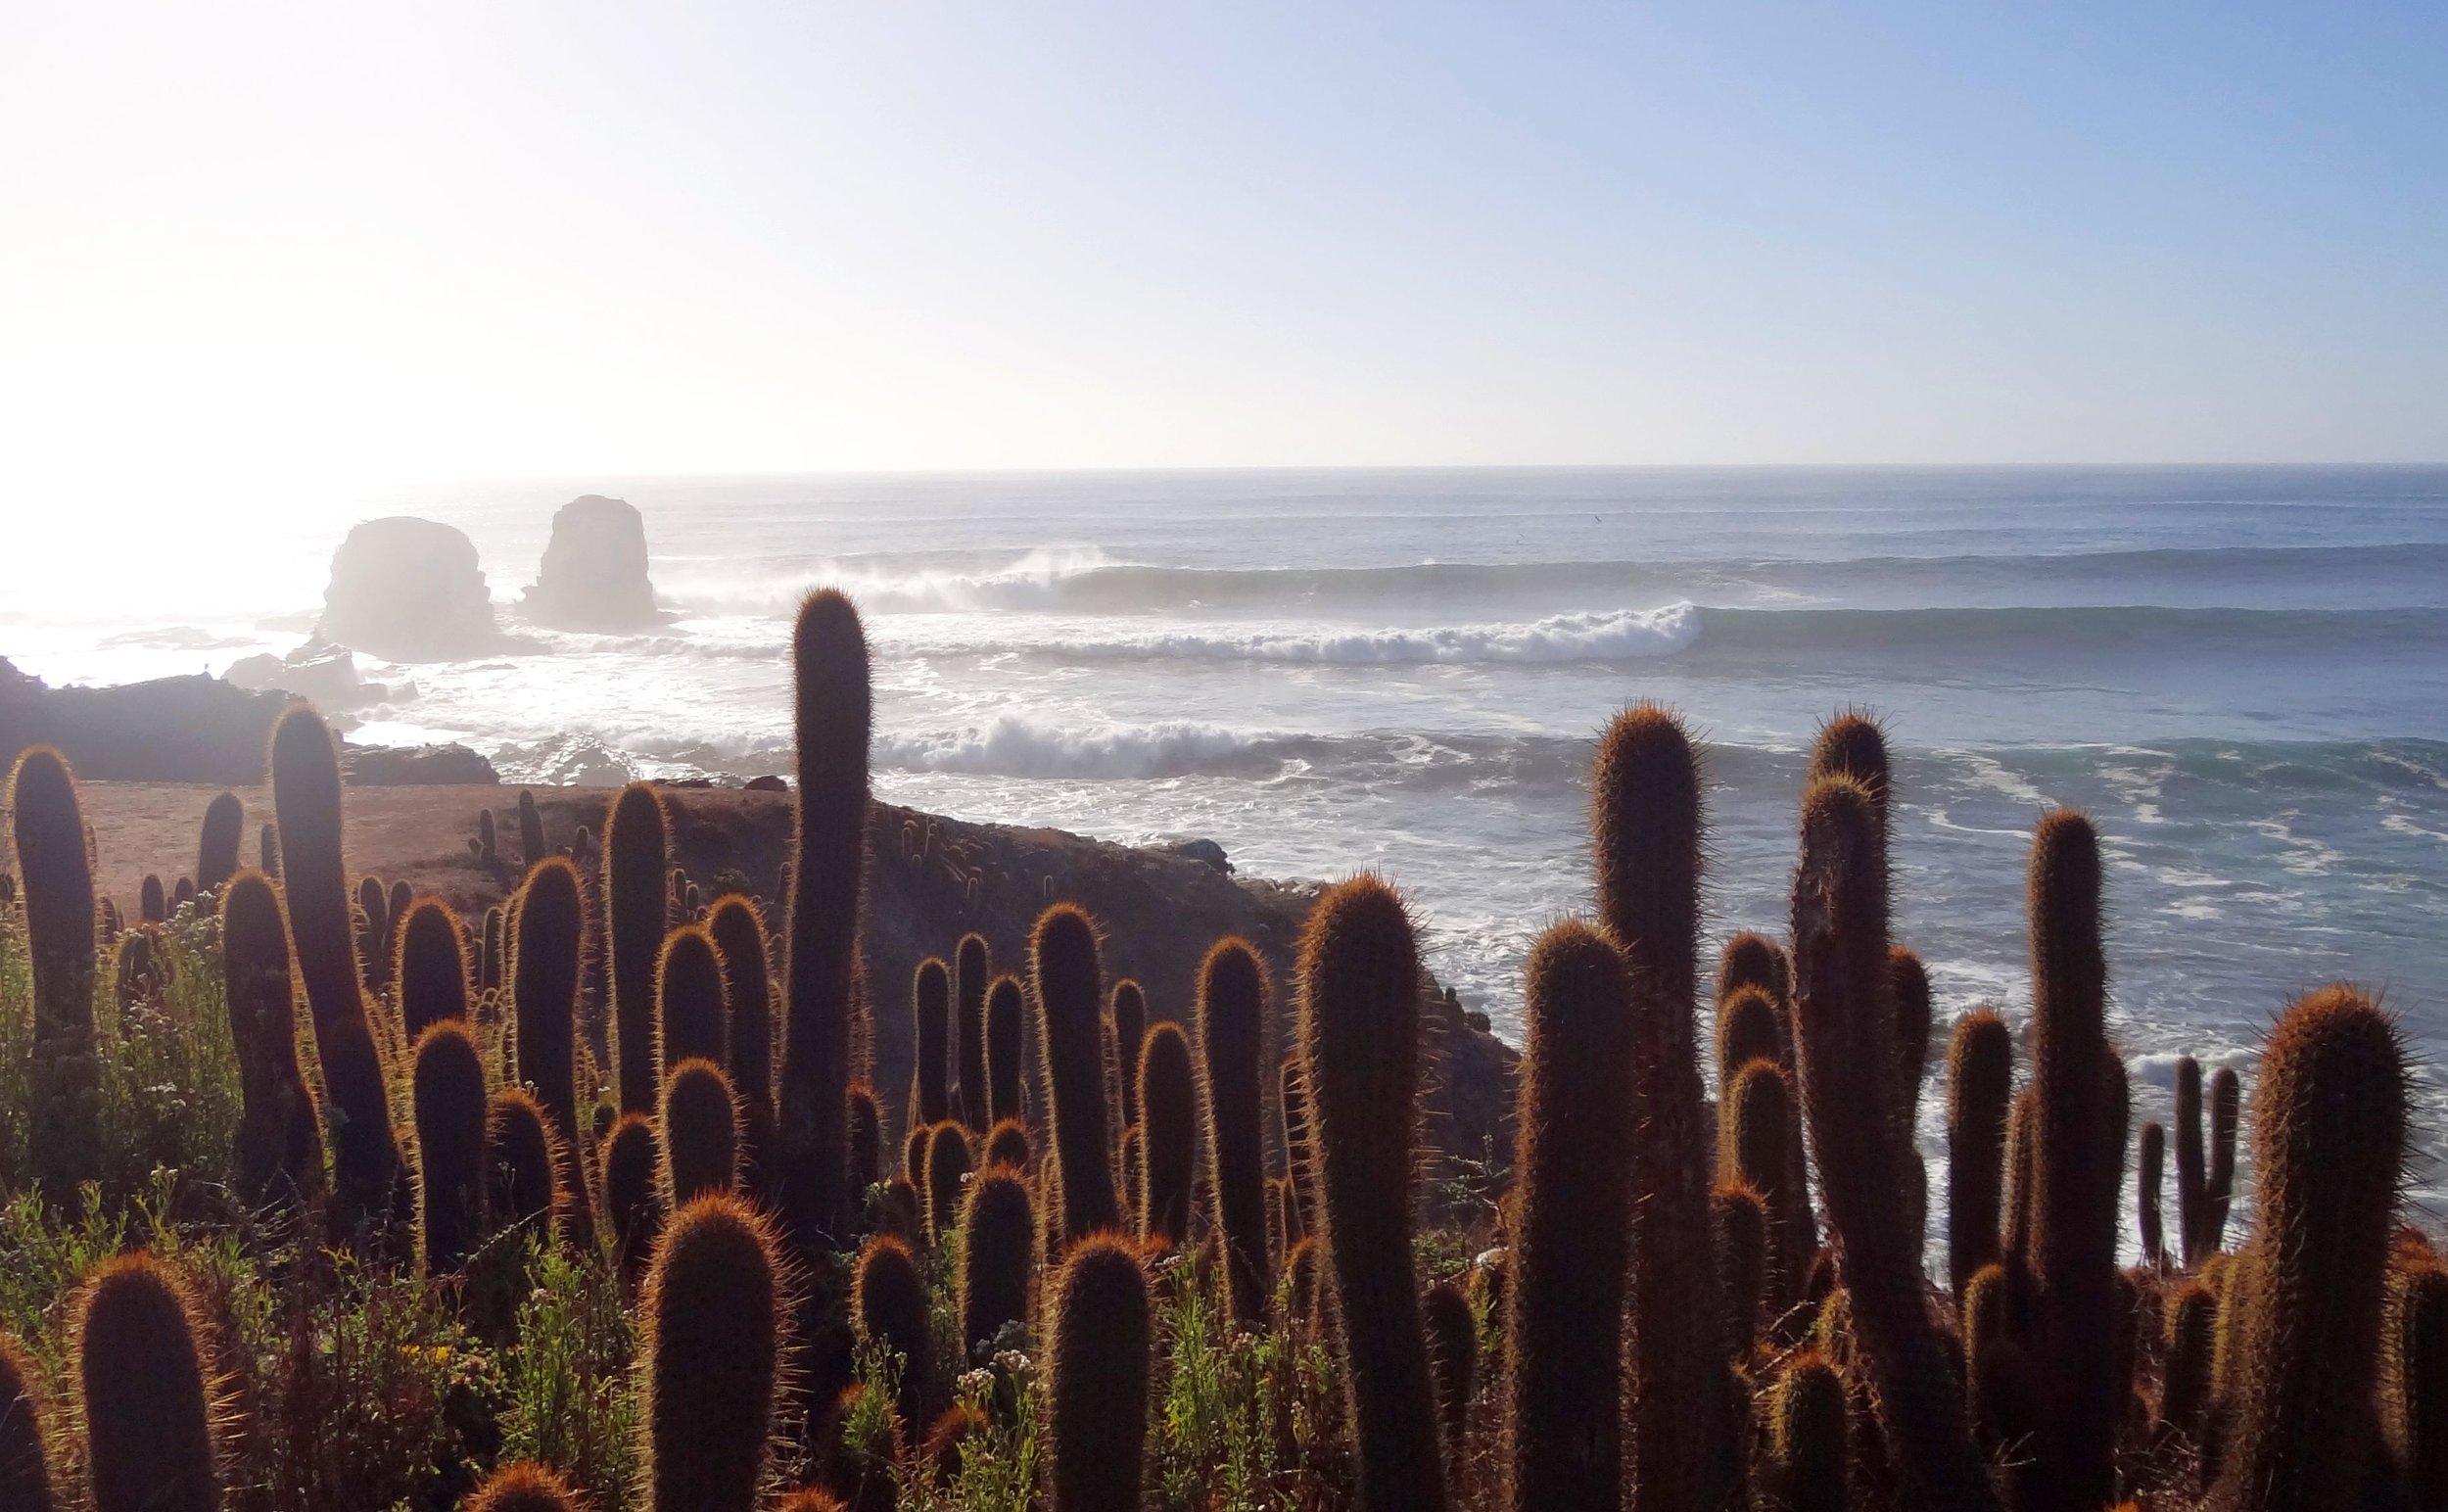 280212-Punta-de-Lobos.jpg